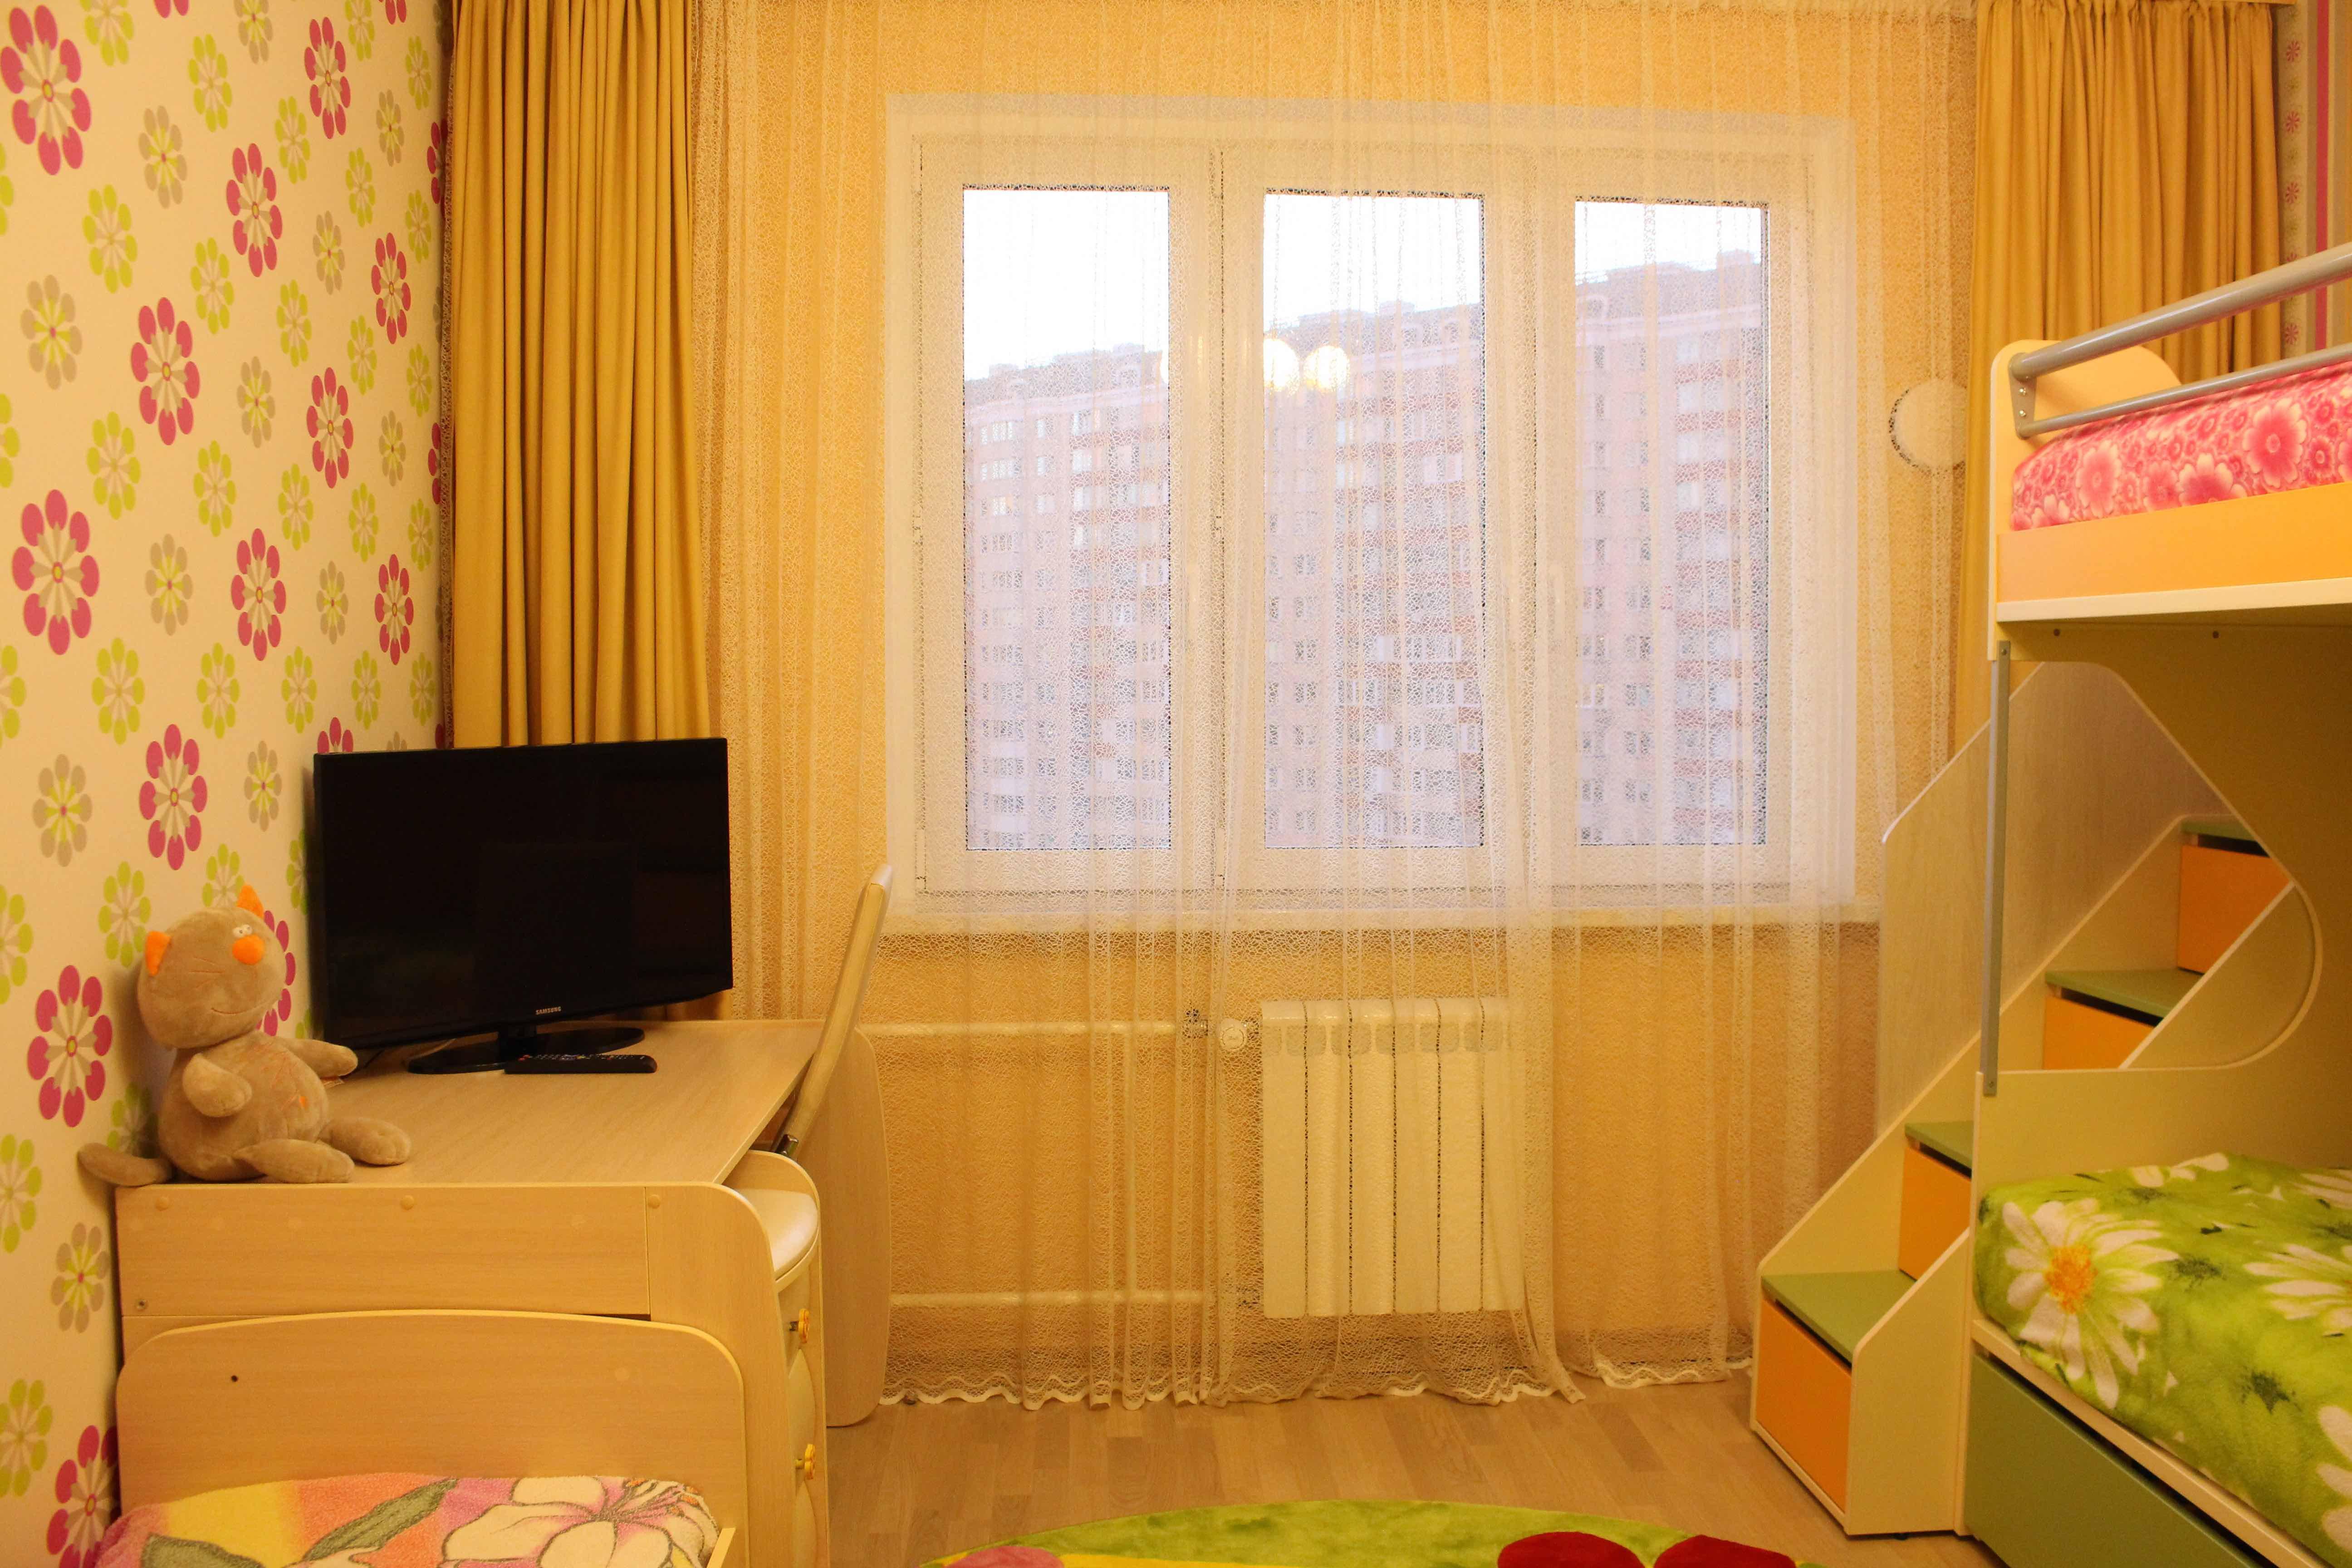 вид на окно в детской комнате